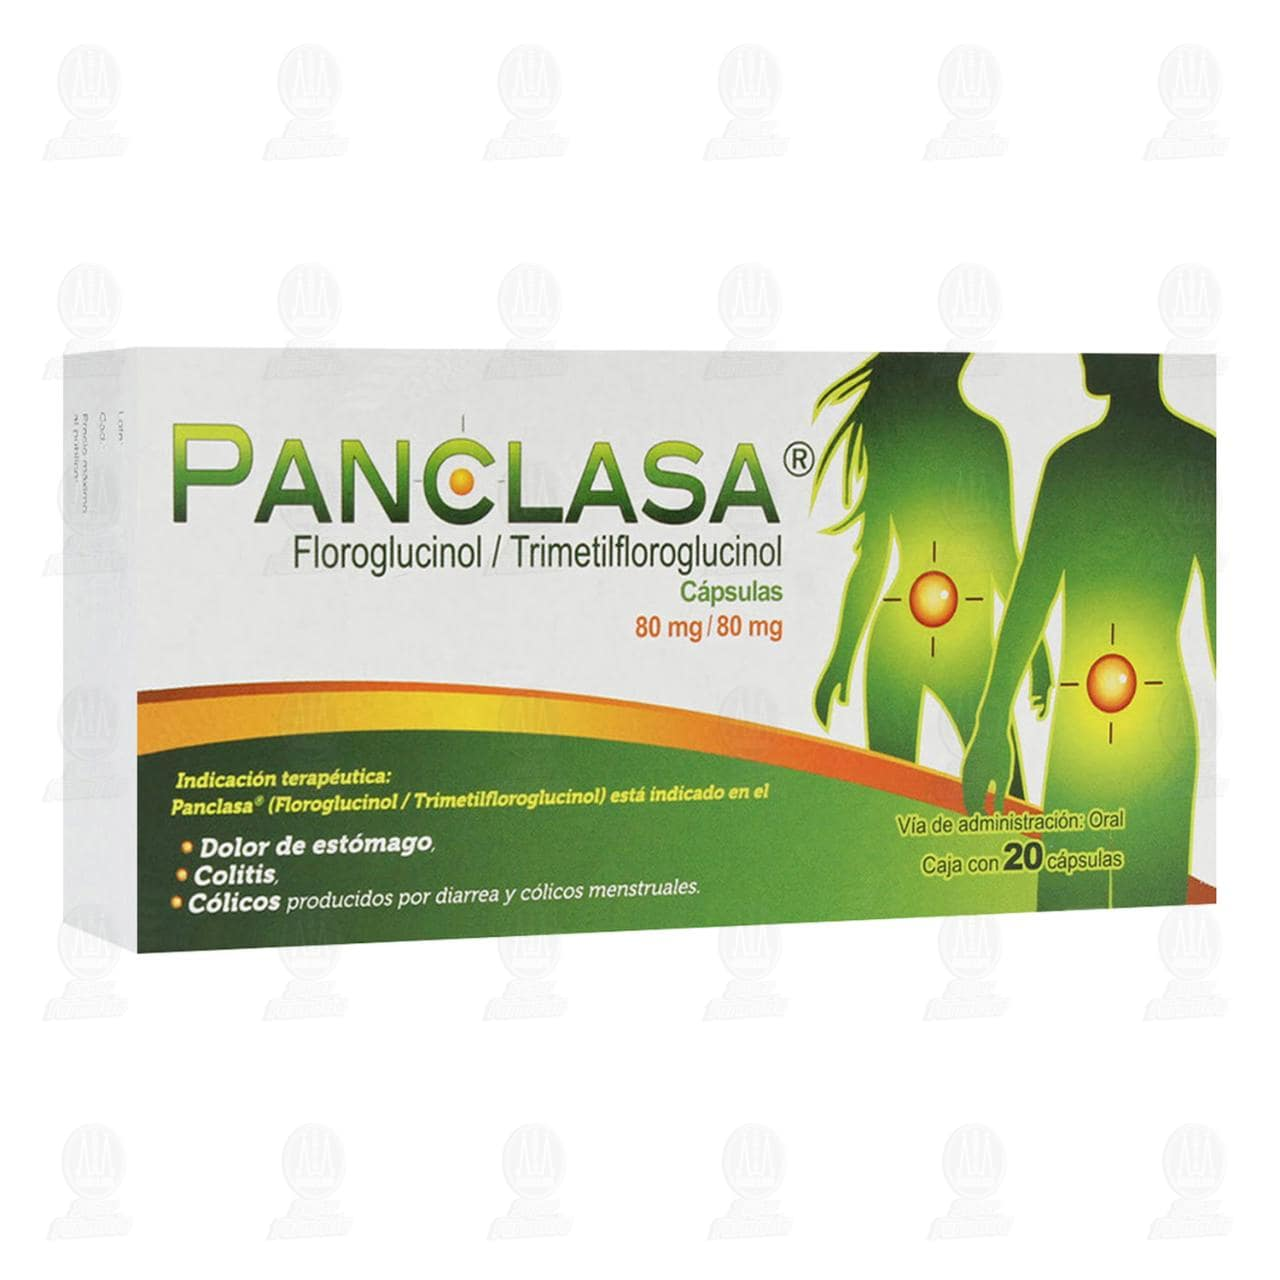 Comprar Panclasa 80mg/80mg 20 Cápsulas en Farmacias Guadalajara